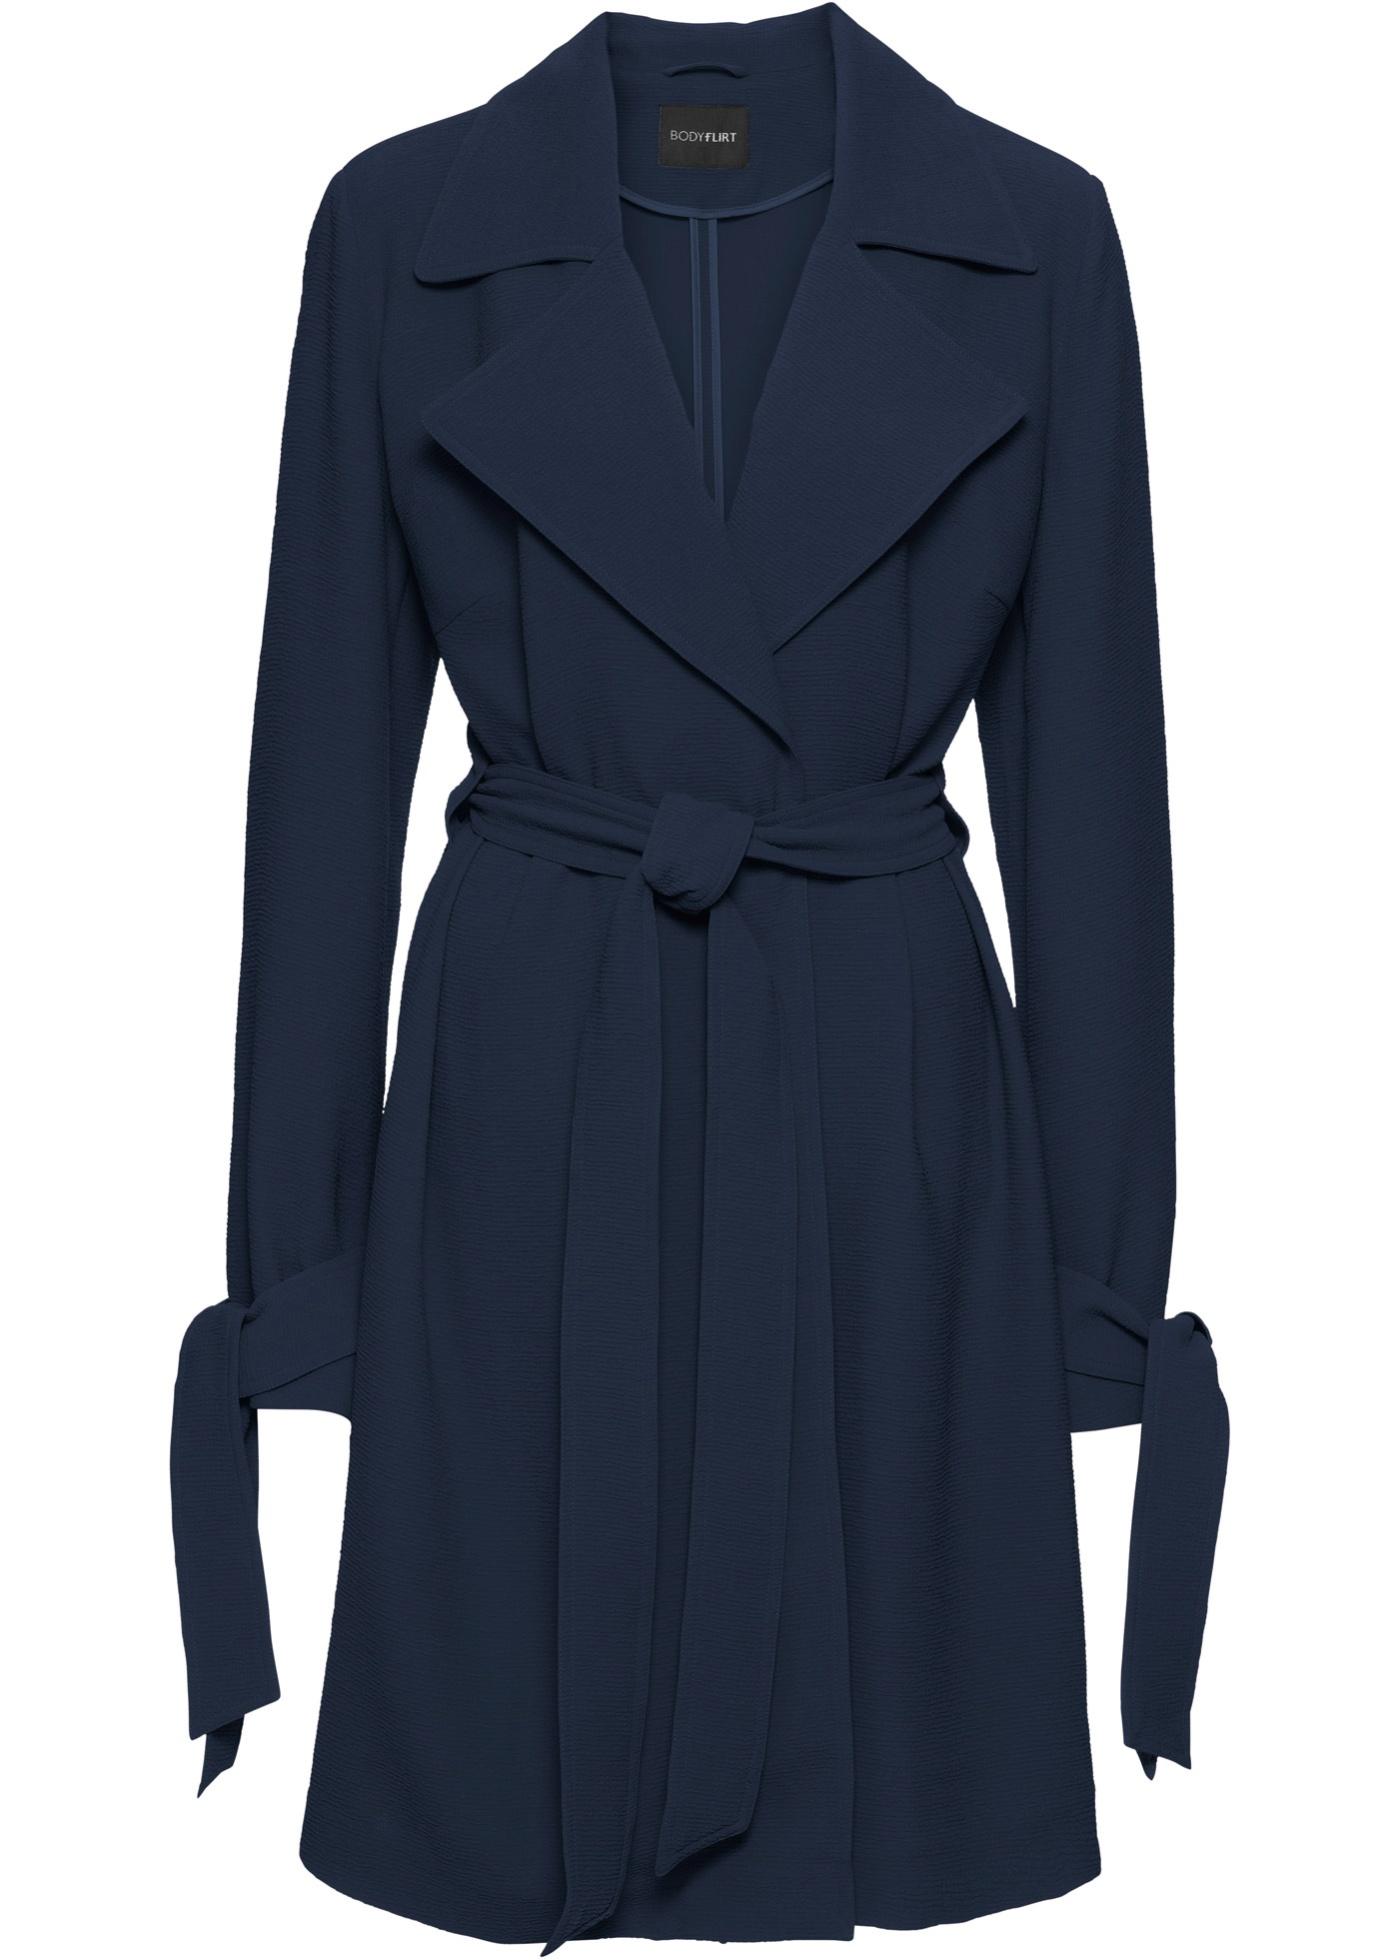 cb0add848e00 Zavinovací kabát bez podšívky - Modrá